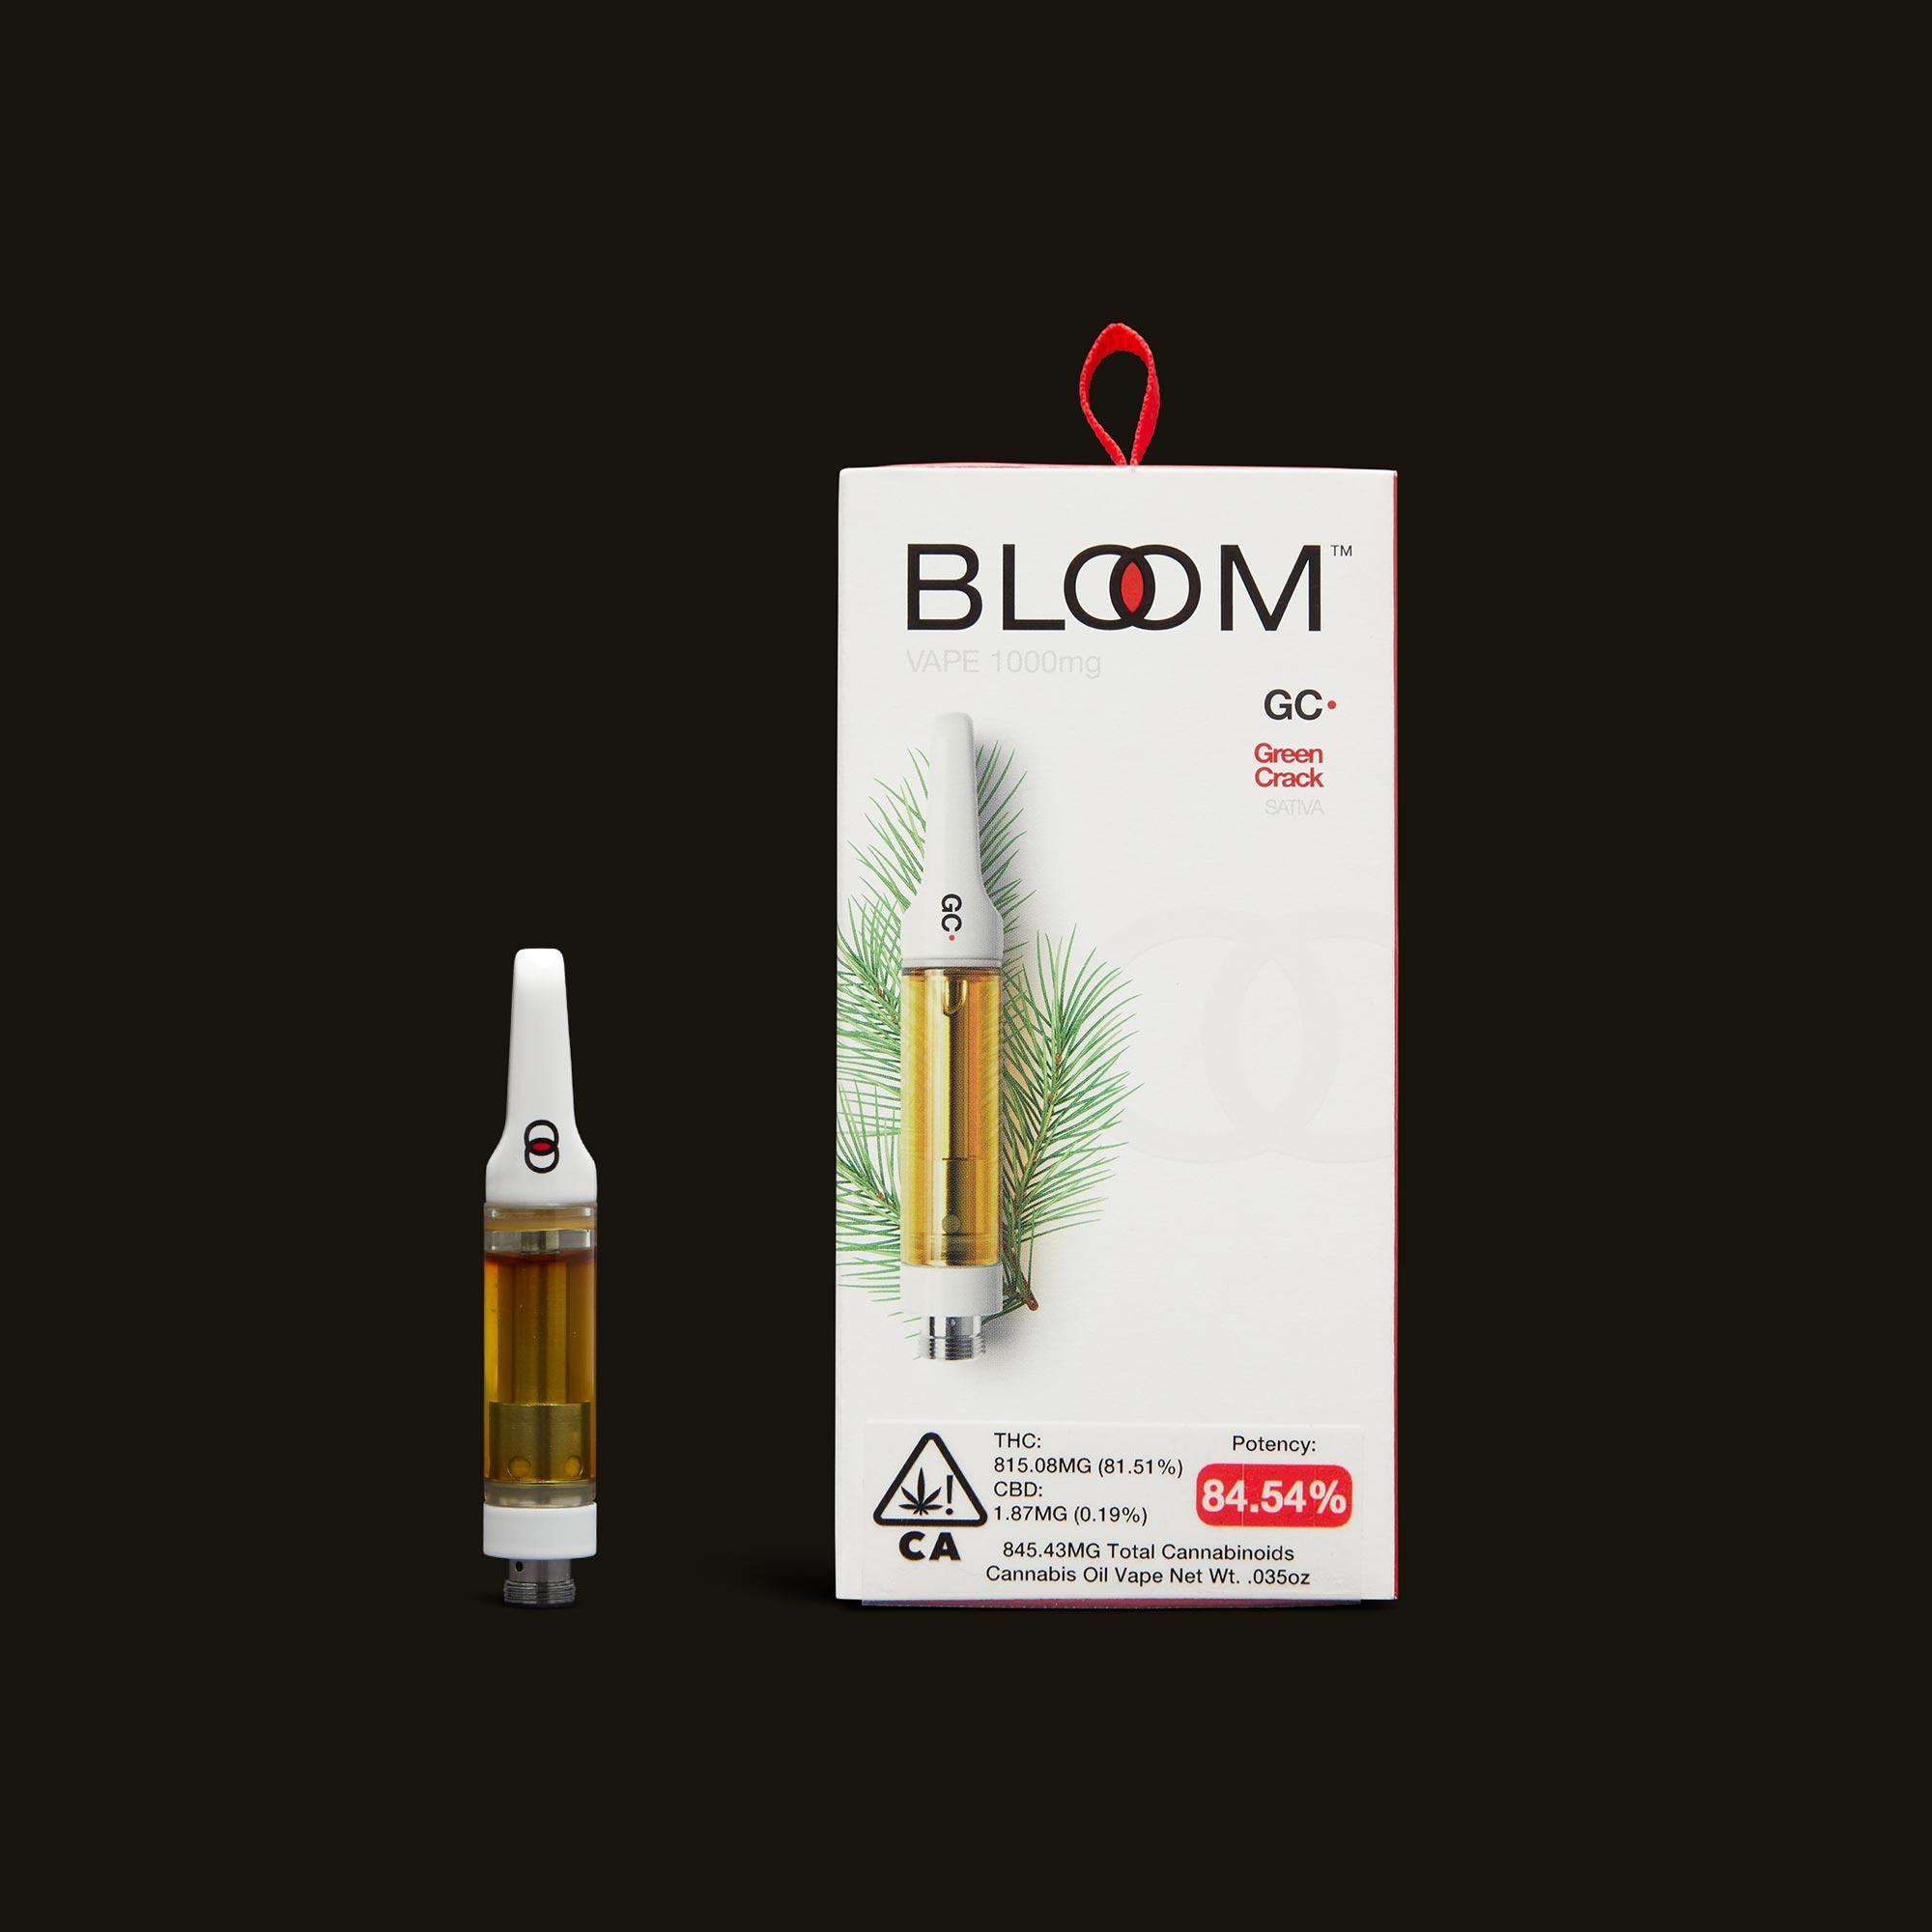 Green Crack Cartridge - 1g by Bloom Brands